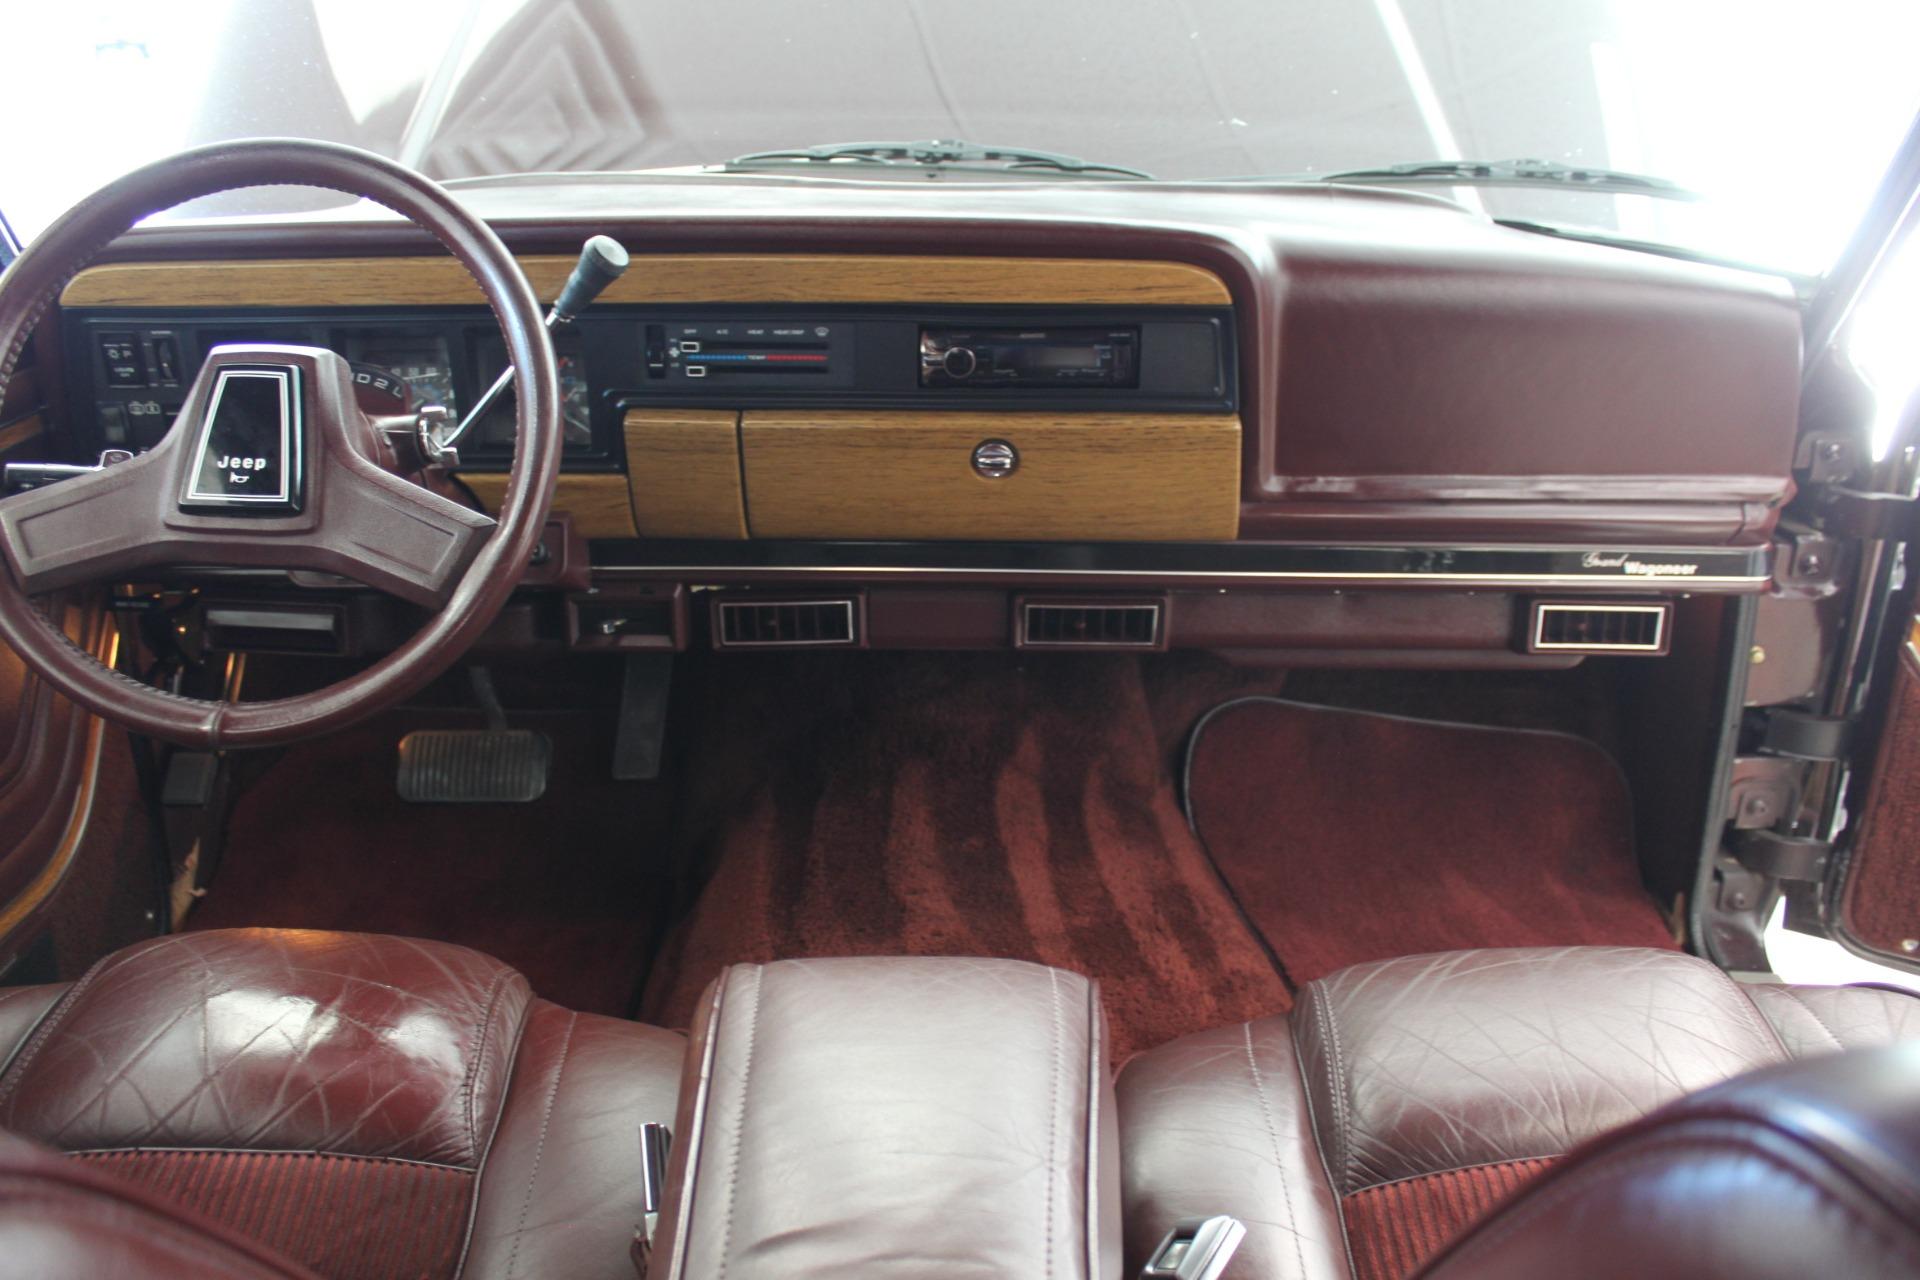 Used-1989-Jeep-Grand-Wagoneer-Limited-4X4-Luxury-Cars-Lake-County